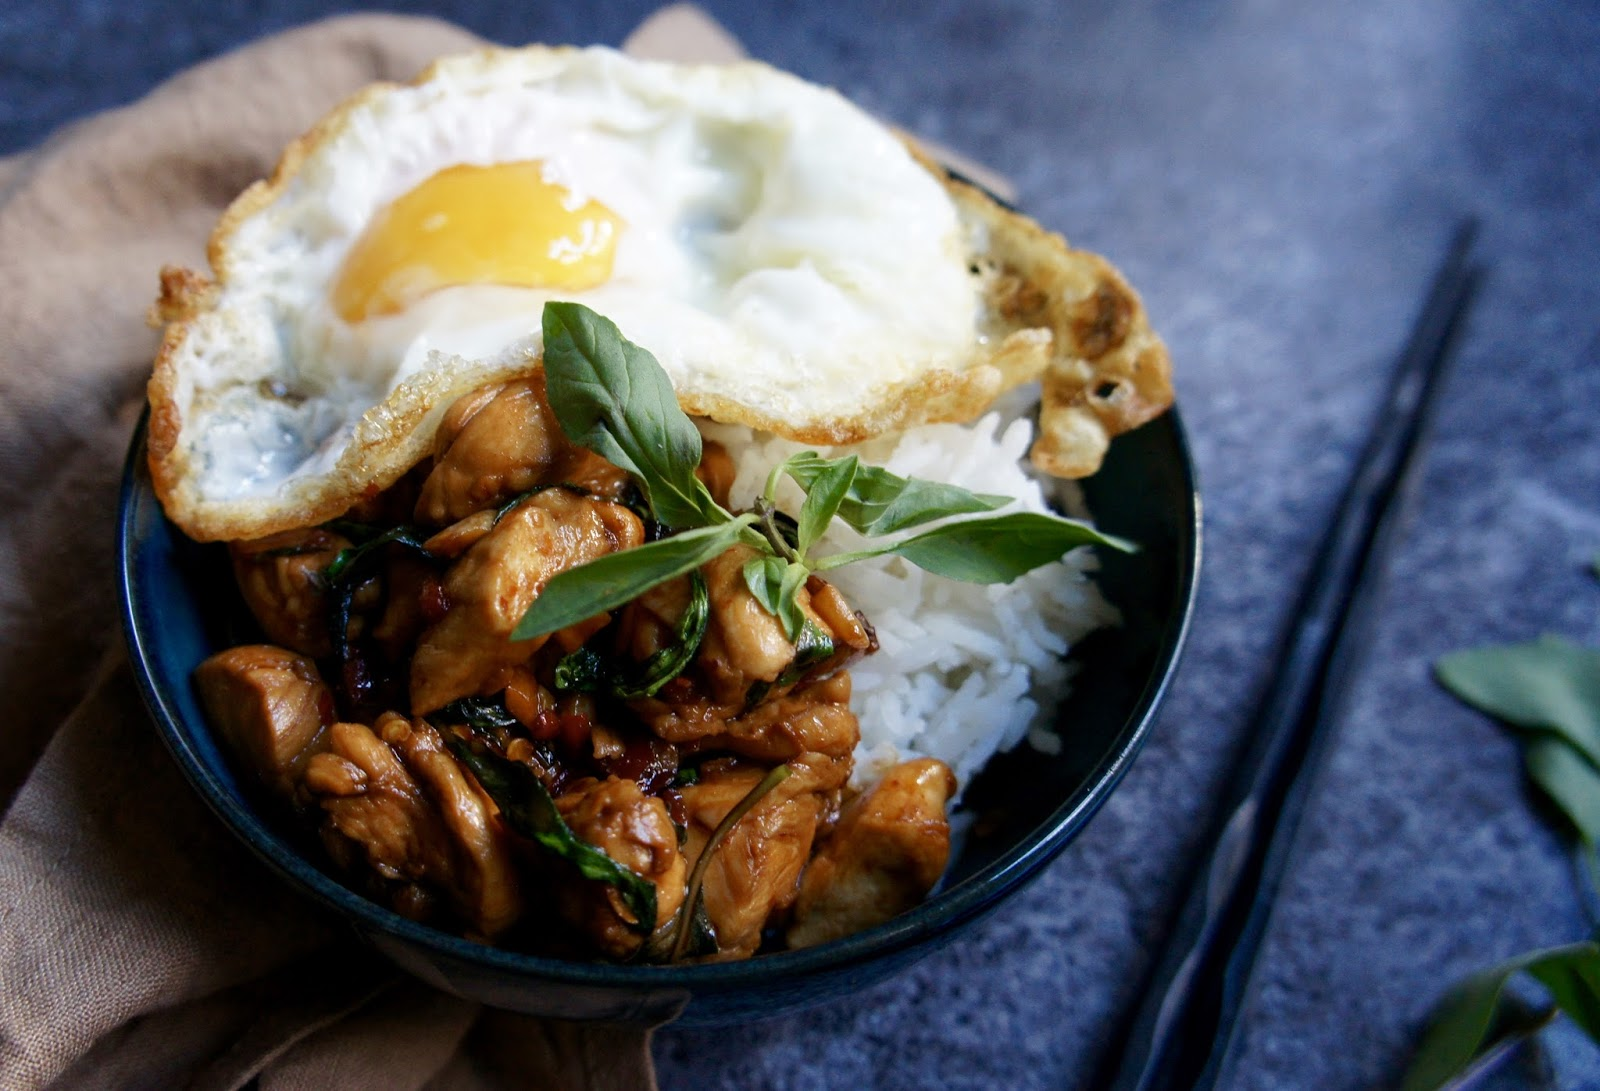 Thai Basil Chicken {Pad kra pao gai / ผัดกระเพราไก่}